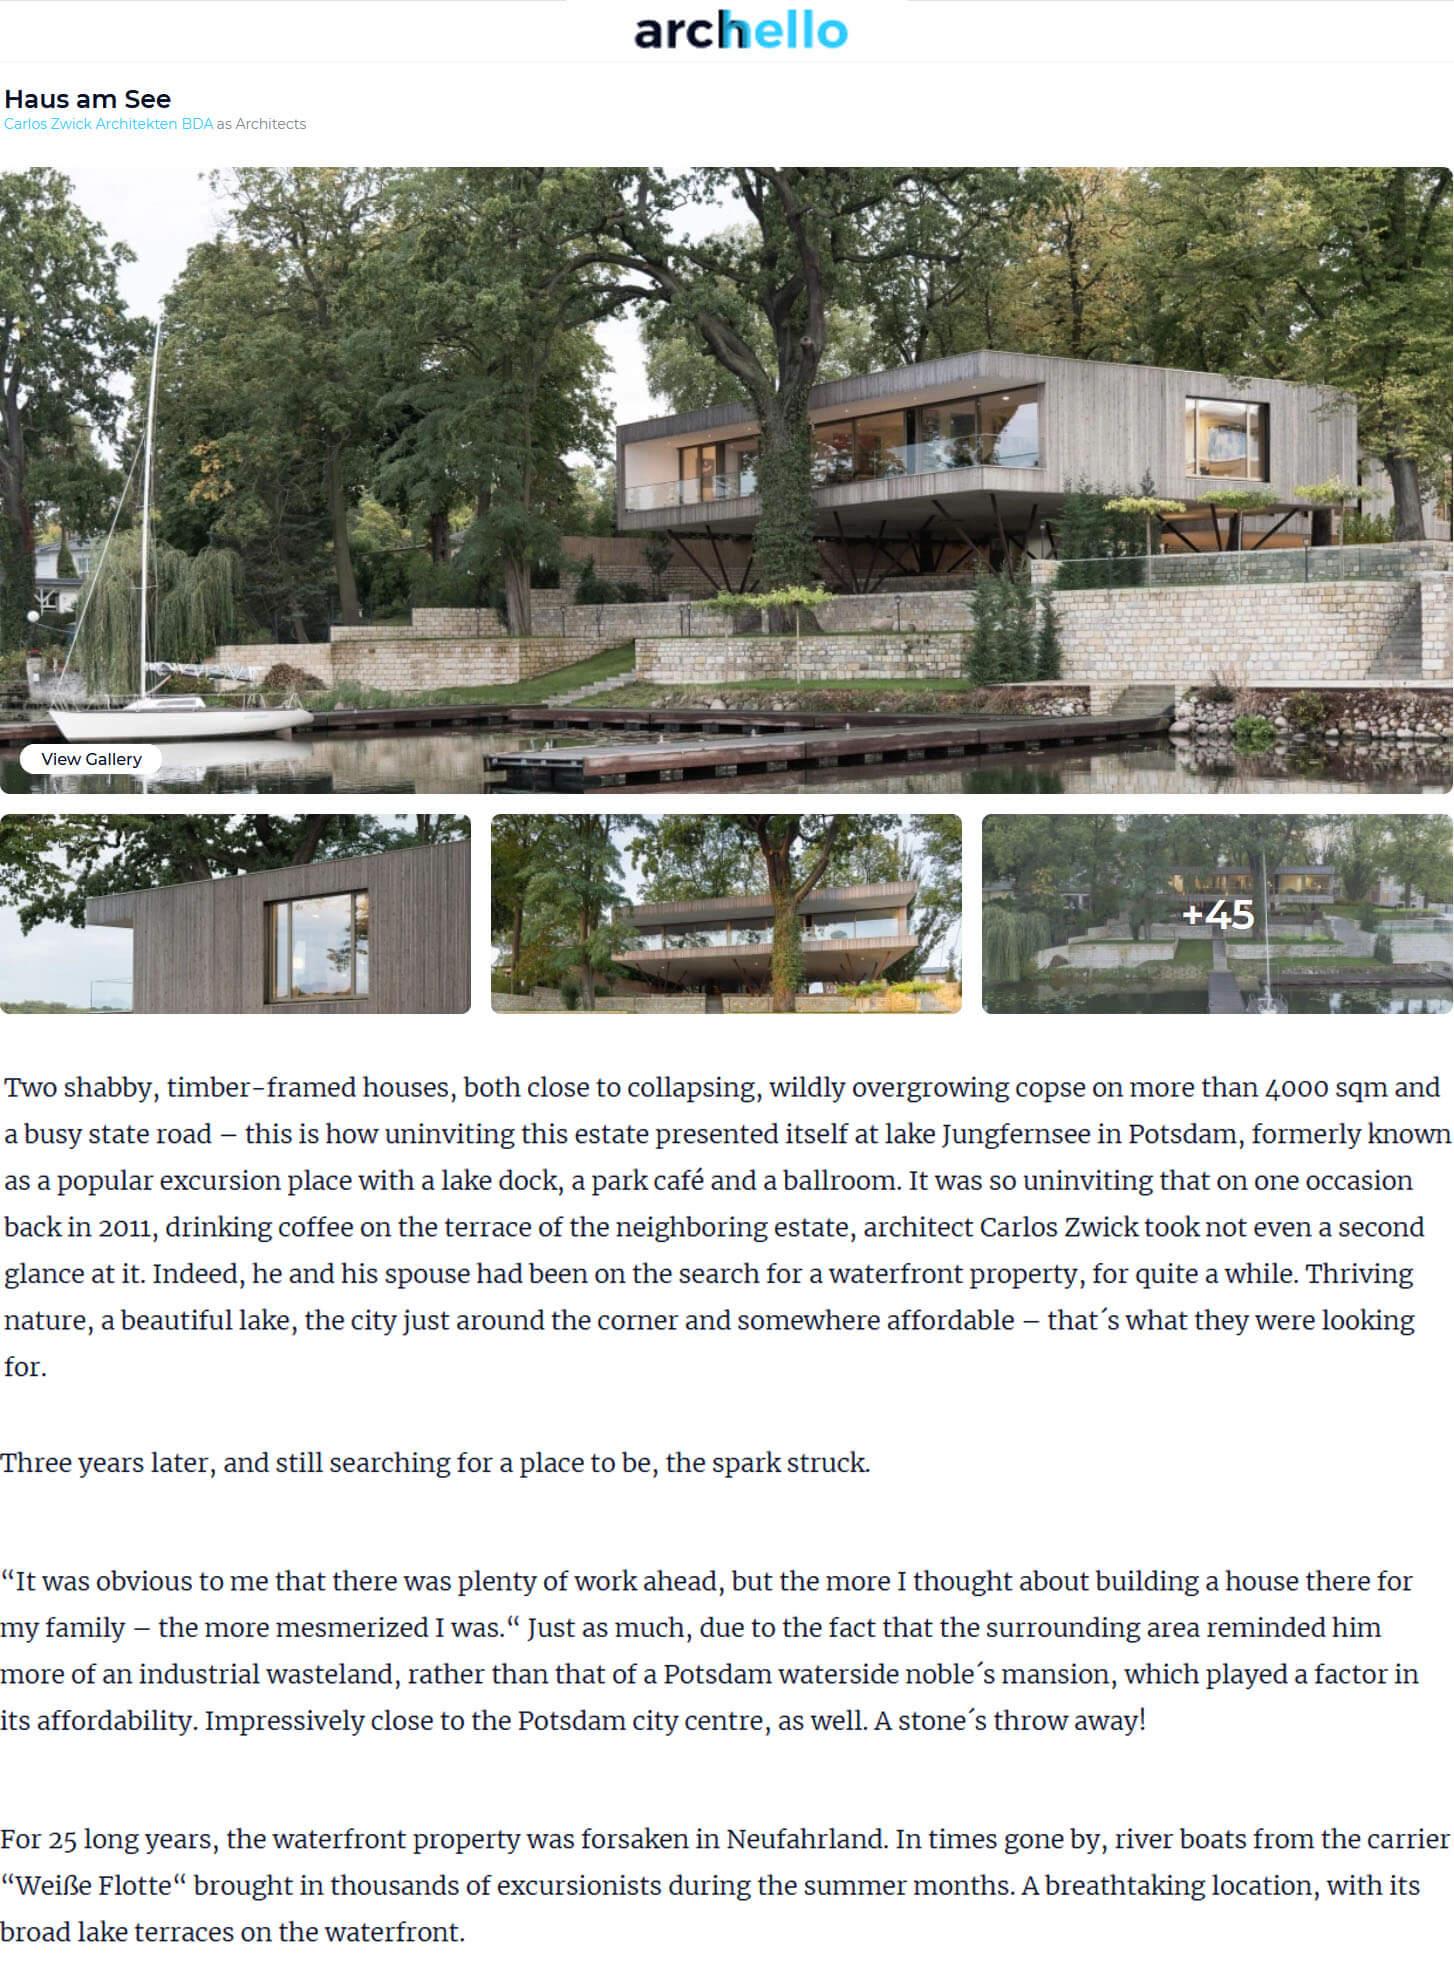 Haus am See in Archello